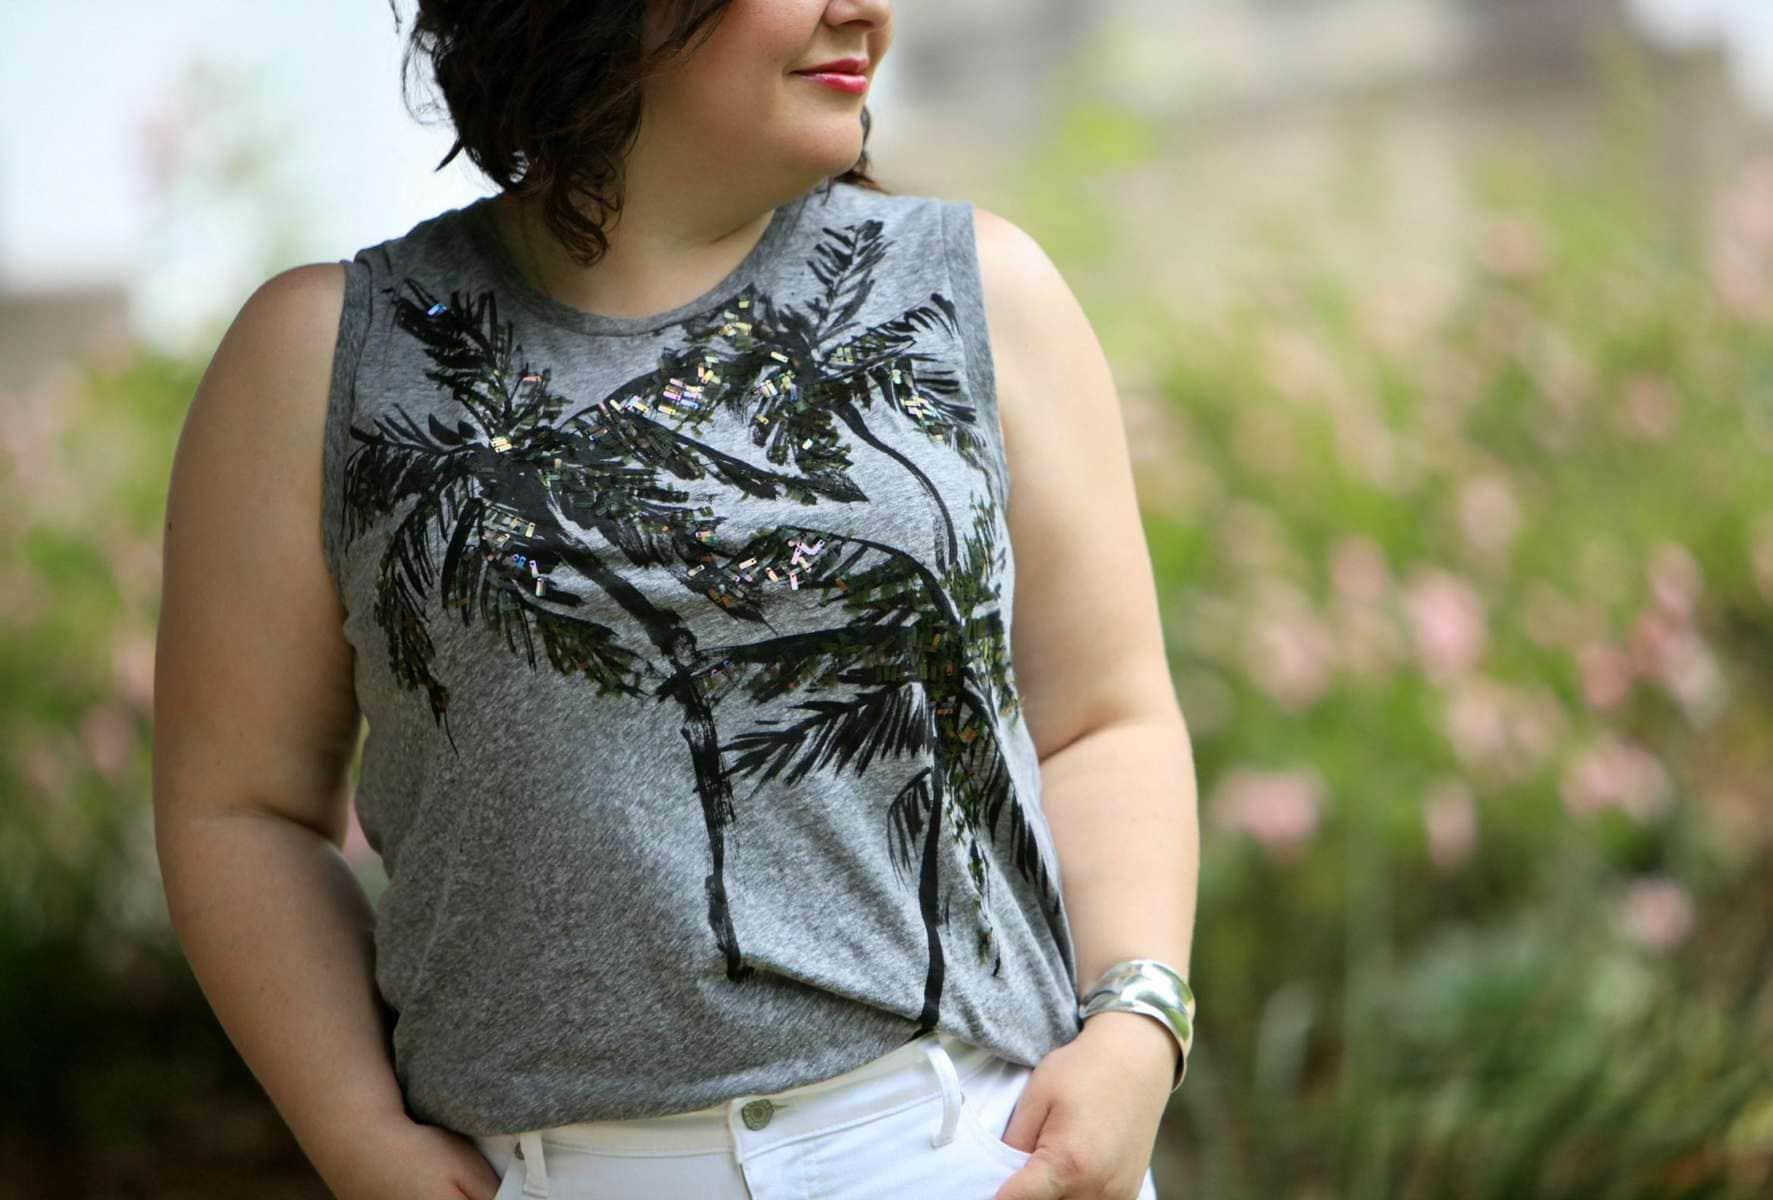 J. Crew sleeveless tee with sequined palm tree design